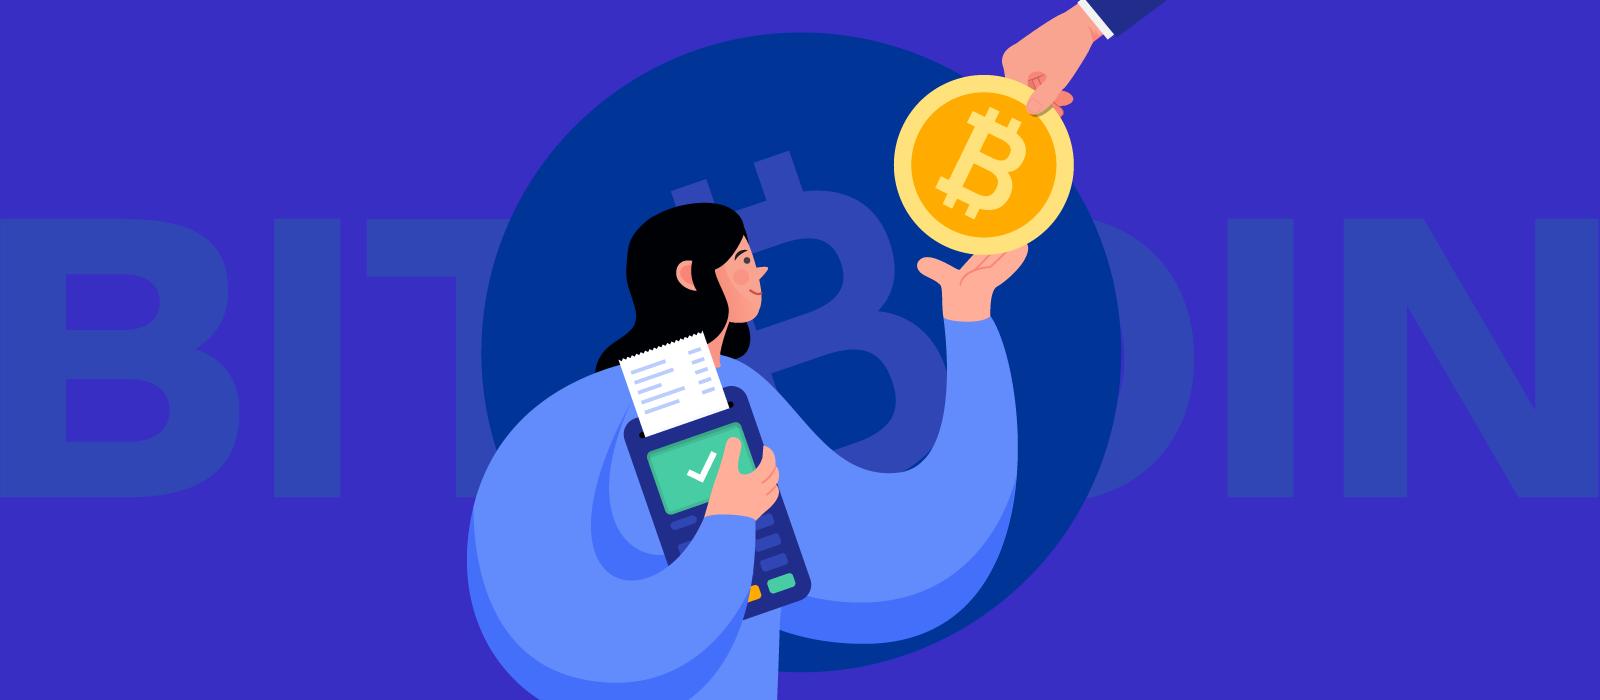 A person with a payment terminal receiving Bitcoin token